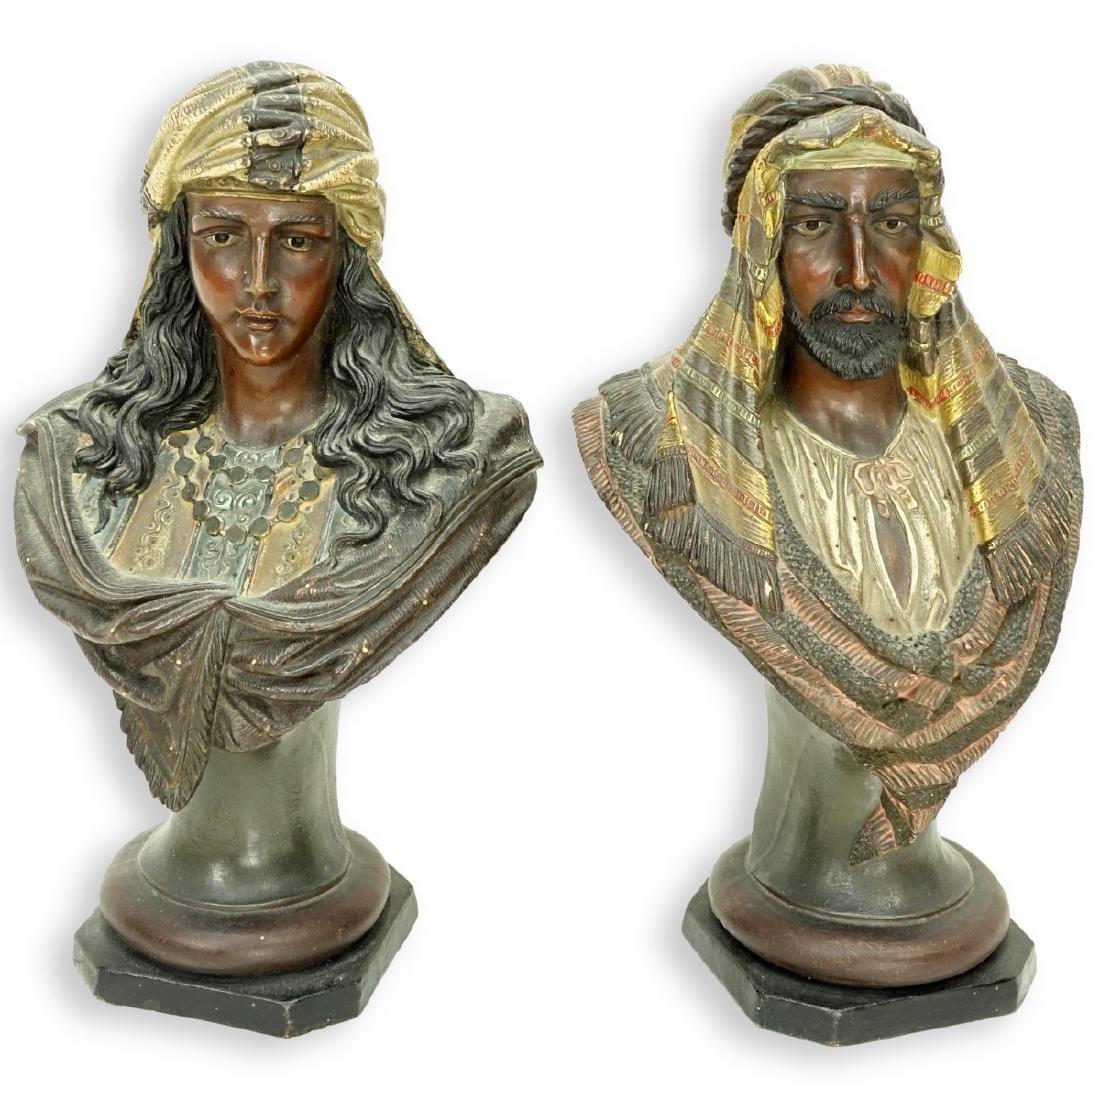 Pair of Polychrome Orientalist Bust Figures